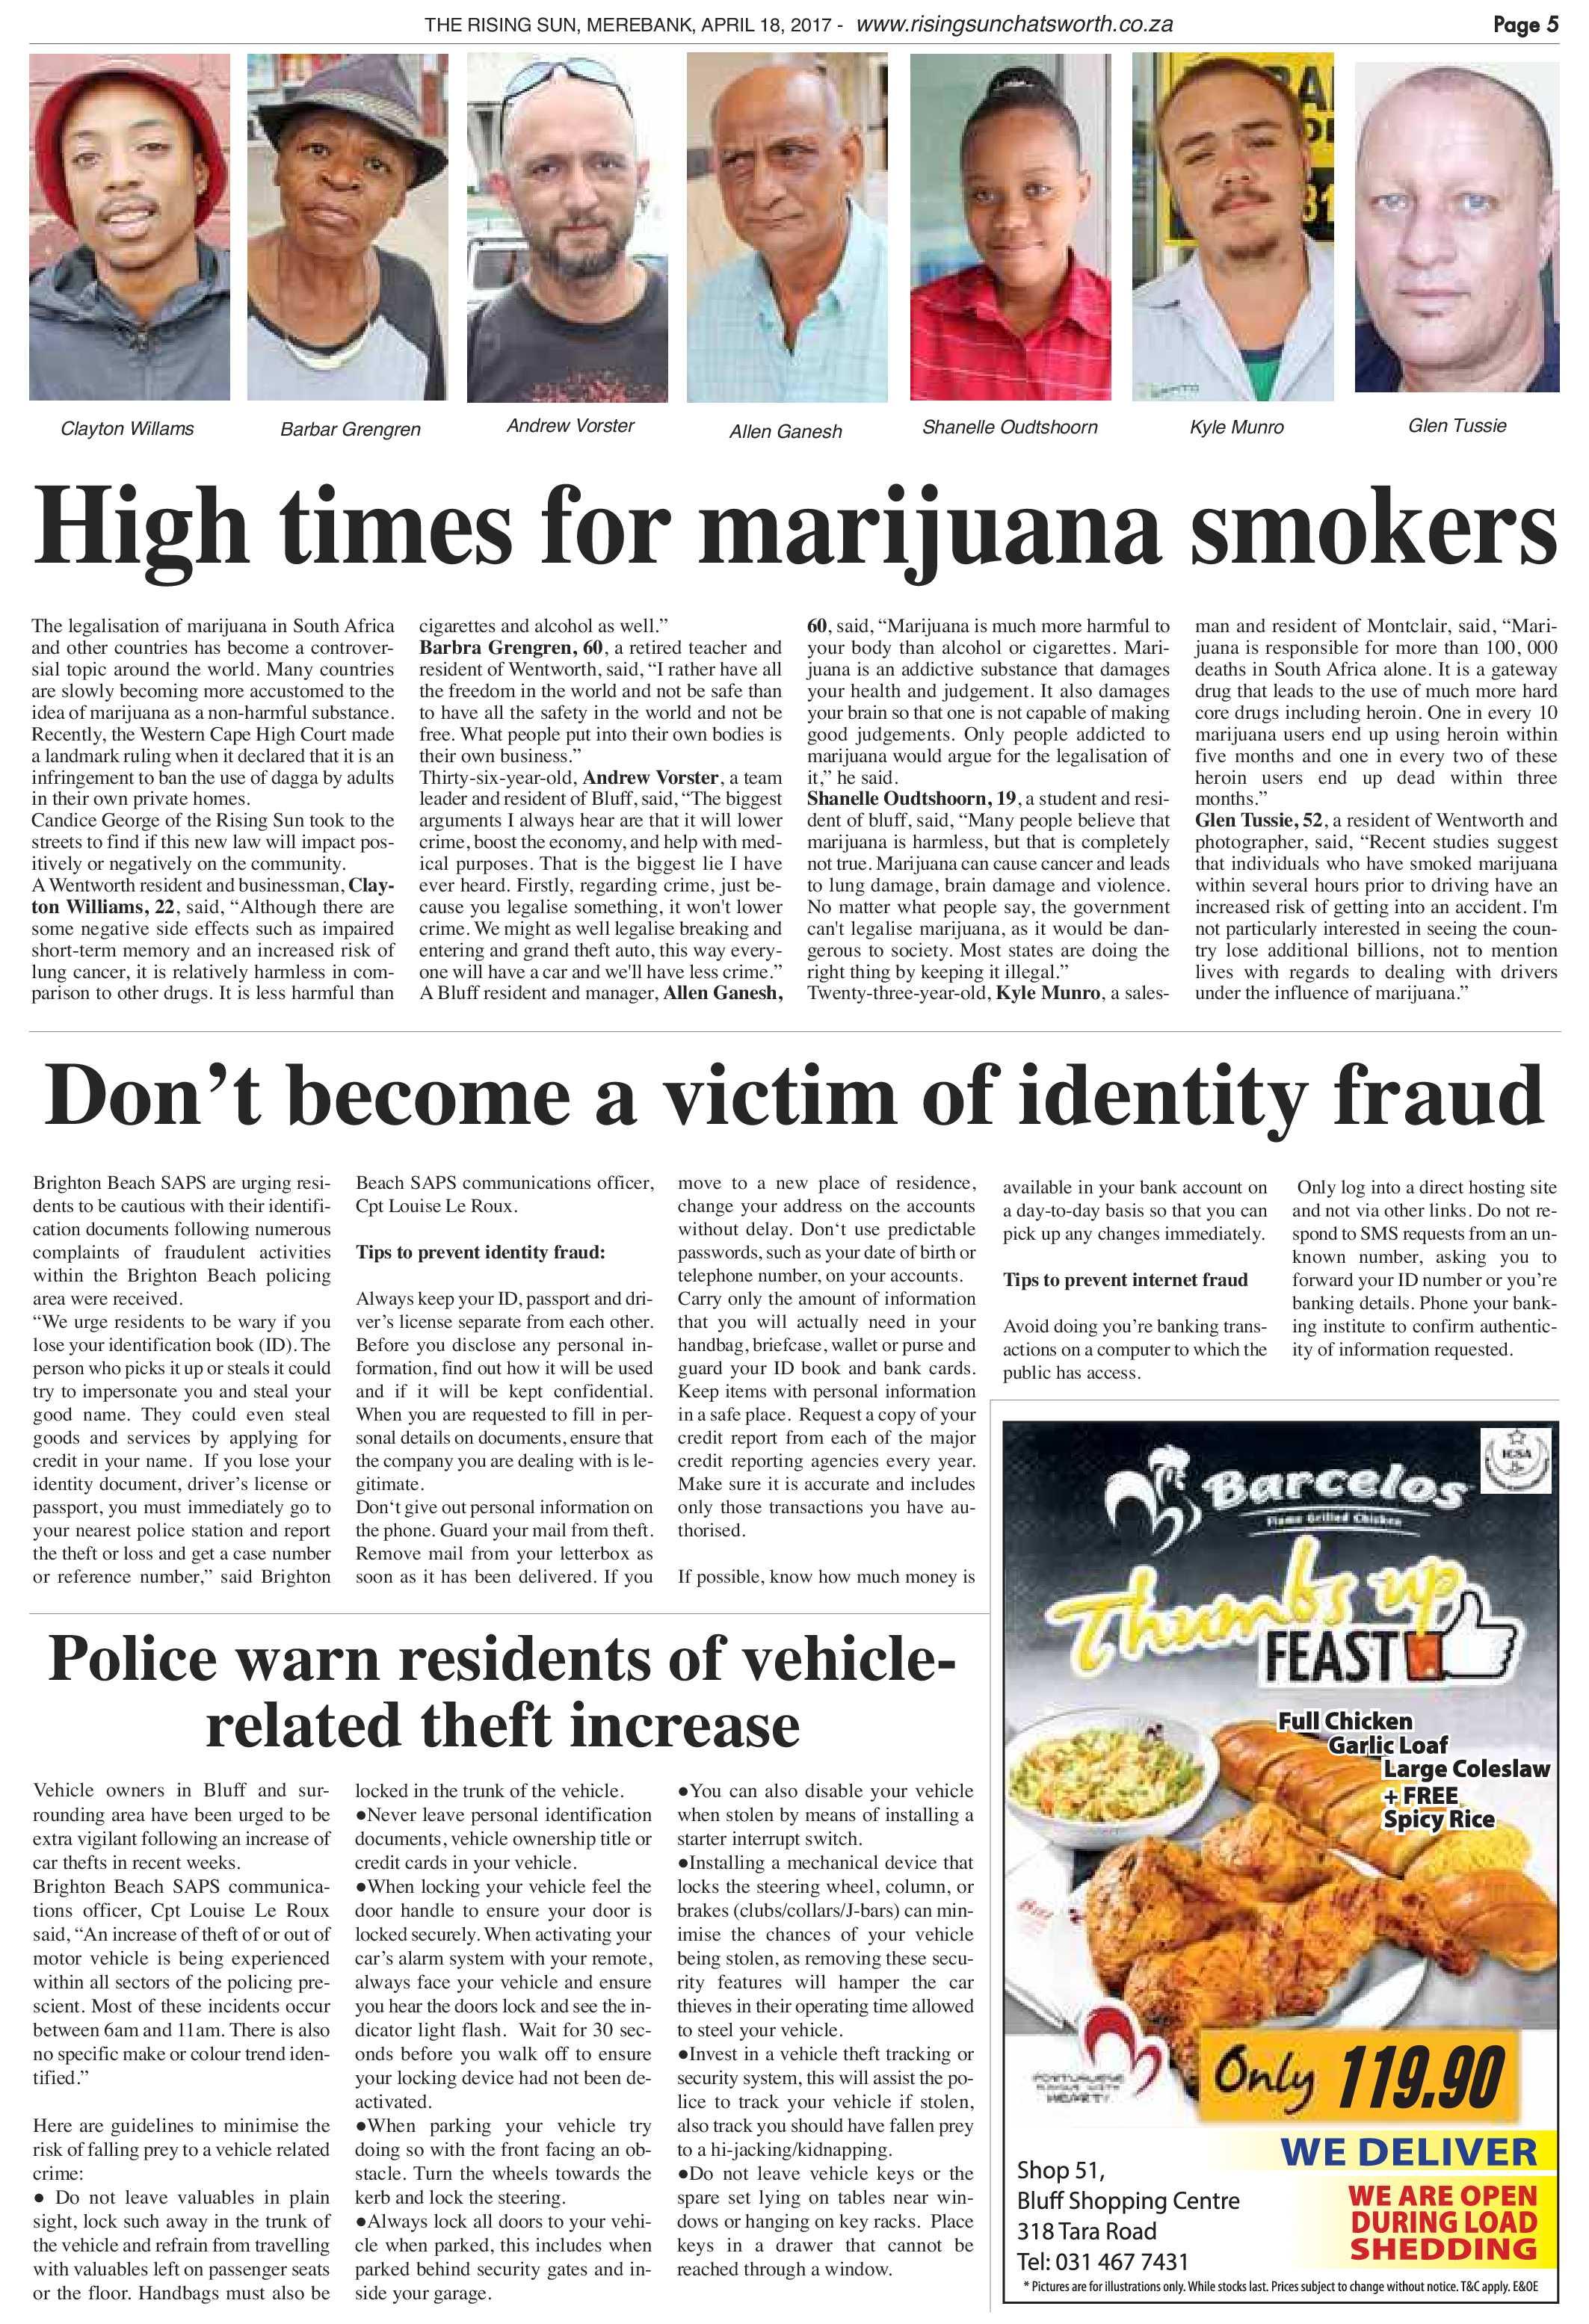 merebank-april-18-epapers-page-5